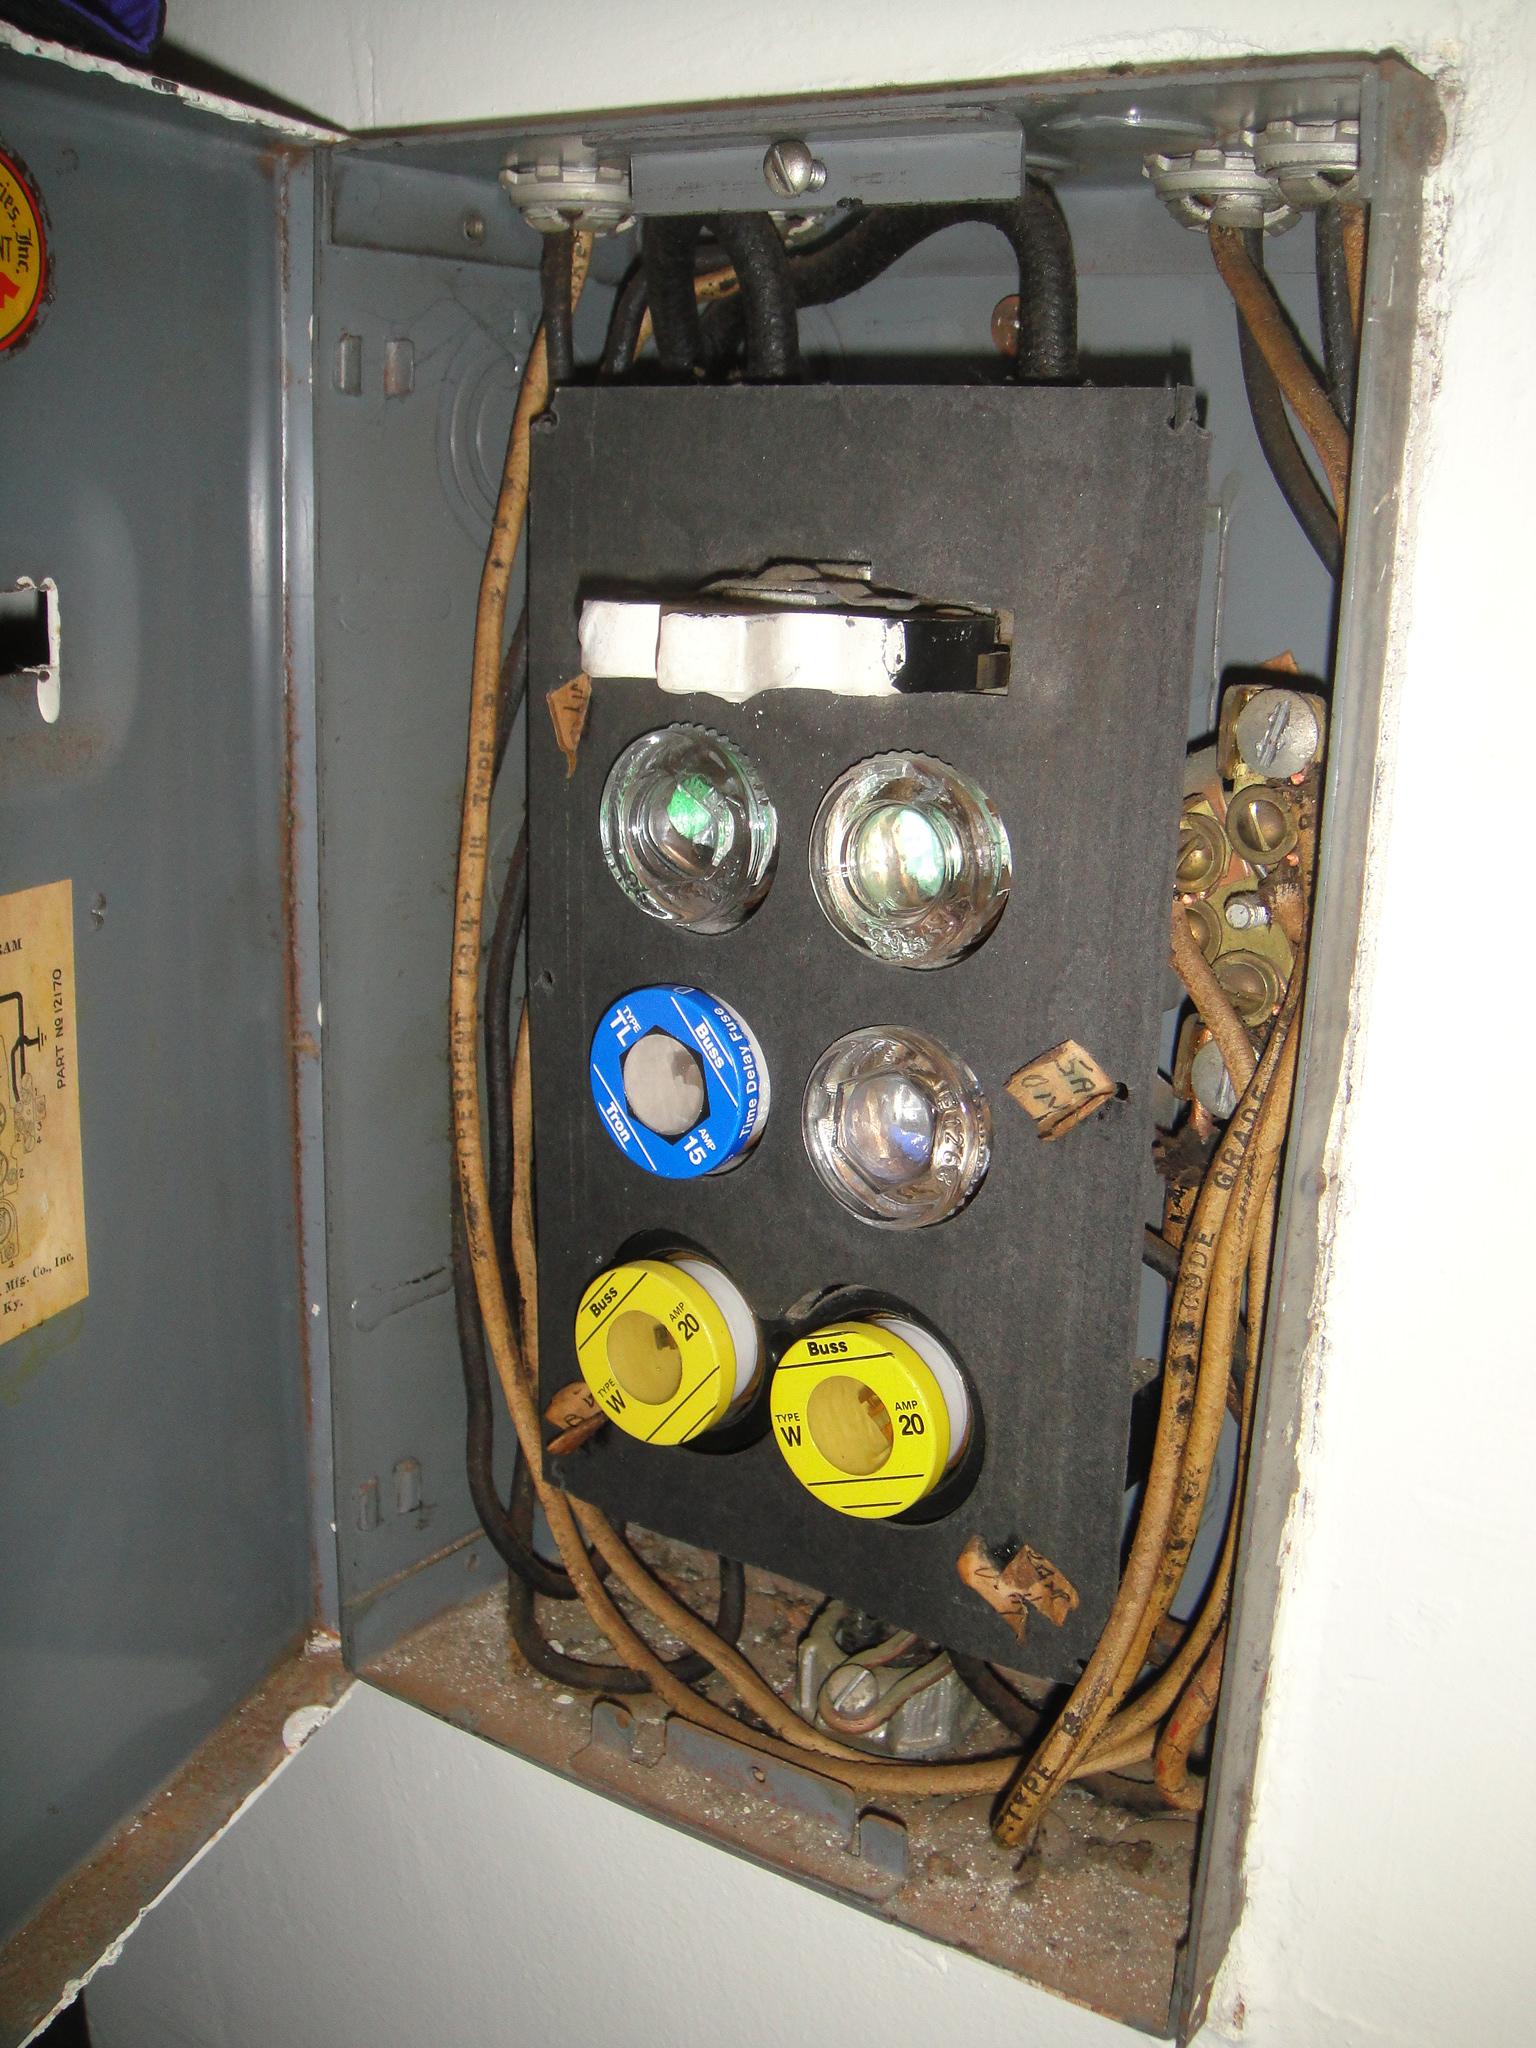 Residential Breaker Box Fuse Types home circuit breaker box ... on electrical wiring, breaker wiring diagram, receptacles wiring, dishwasher wiring, breaker panel,